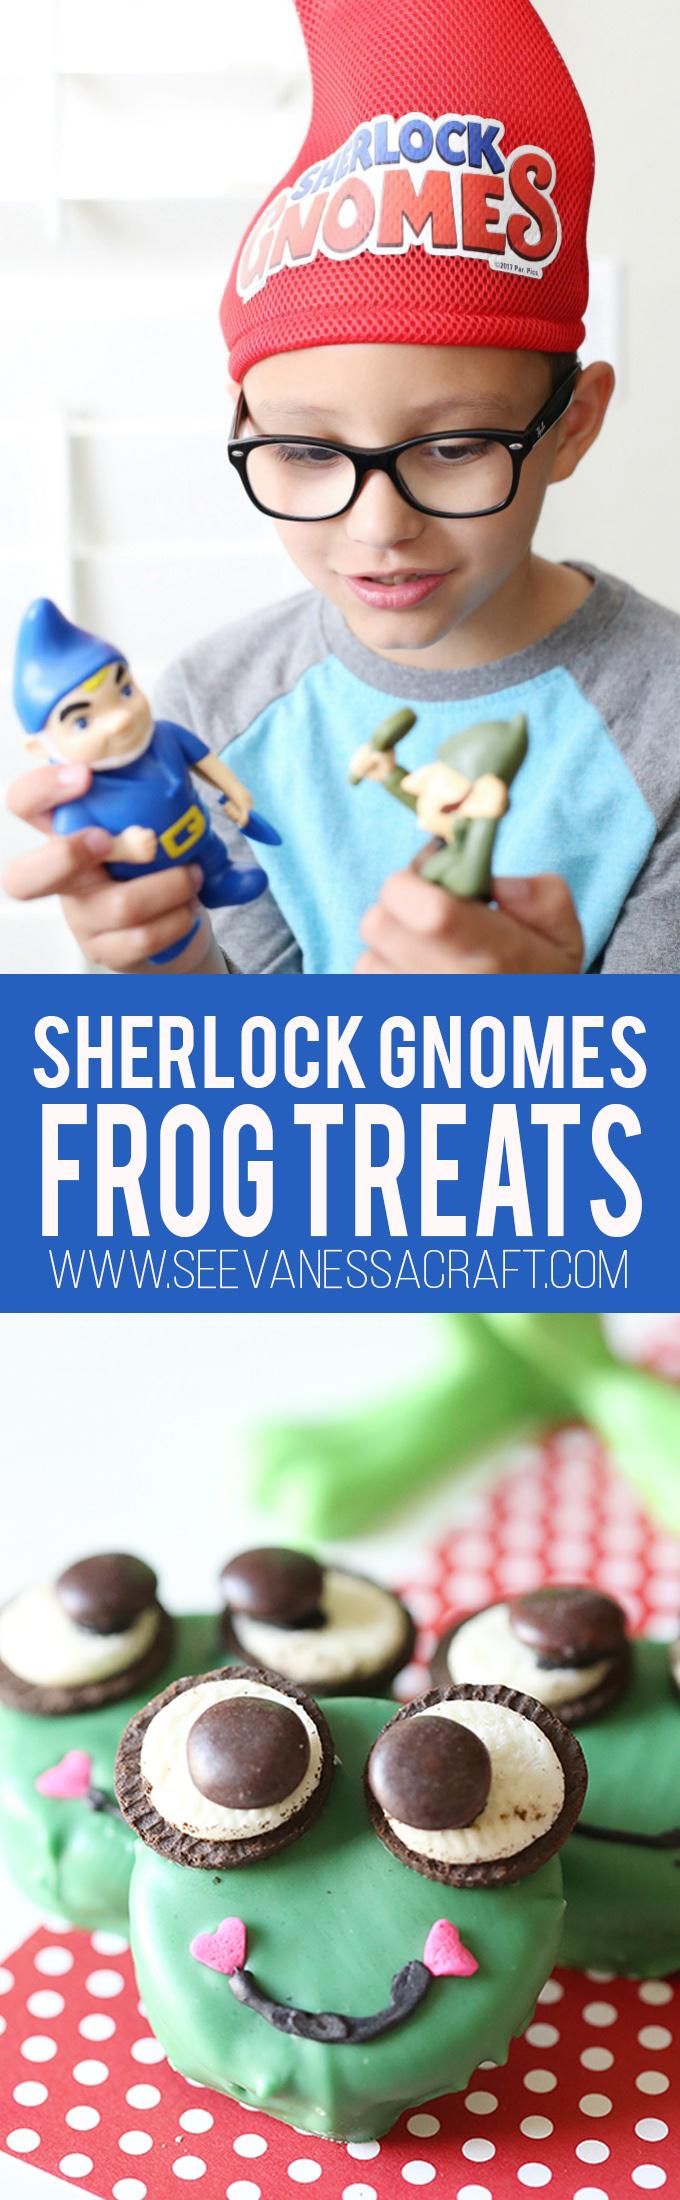 Sherlock-Gnomes-Oreo-Frog-Treat-Idea-for-Kids-and Parties